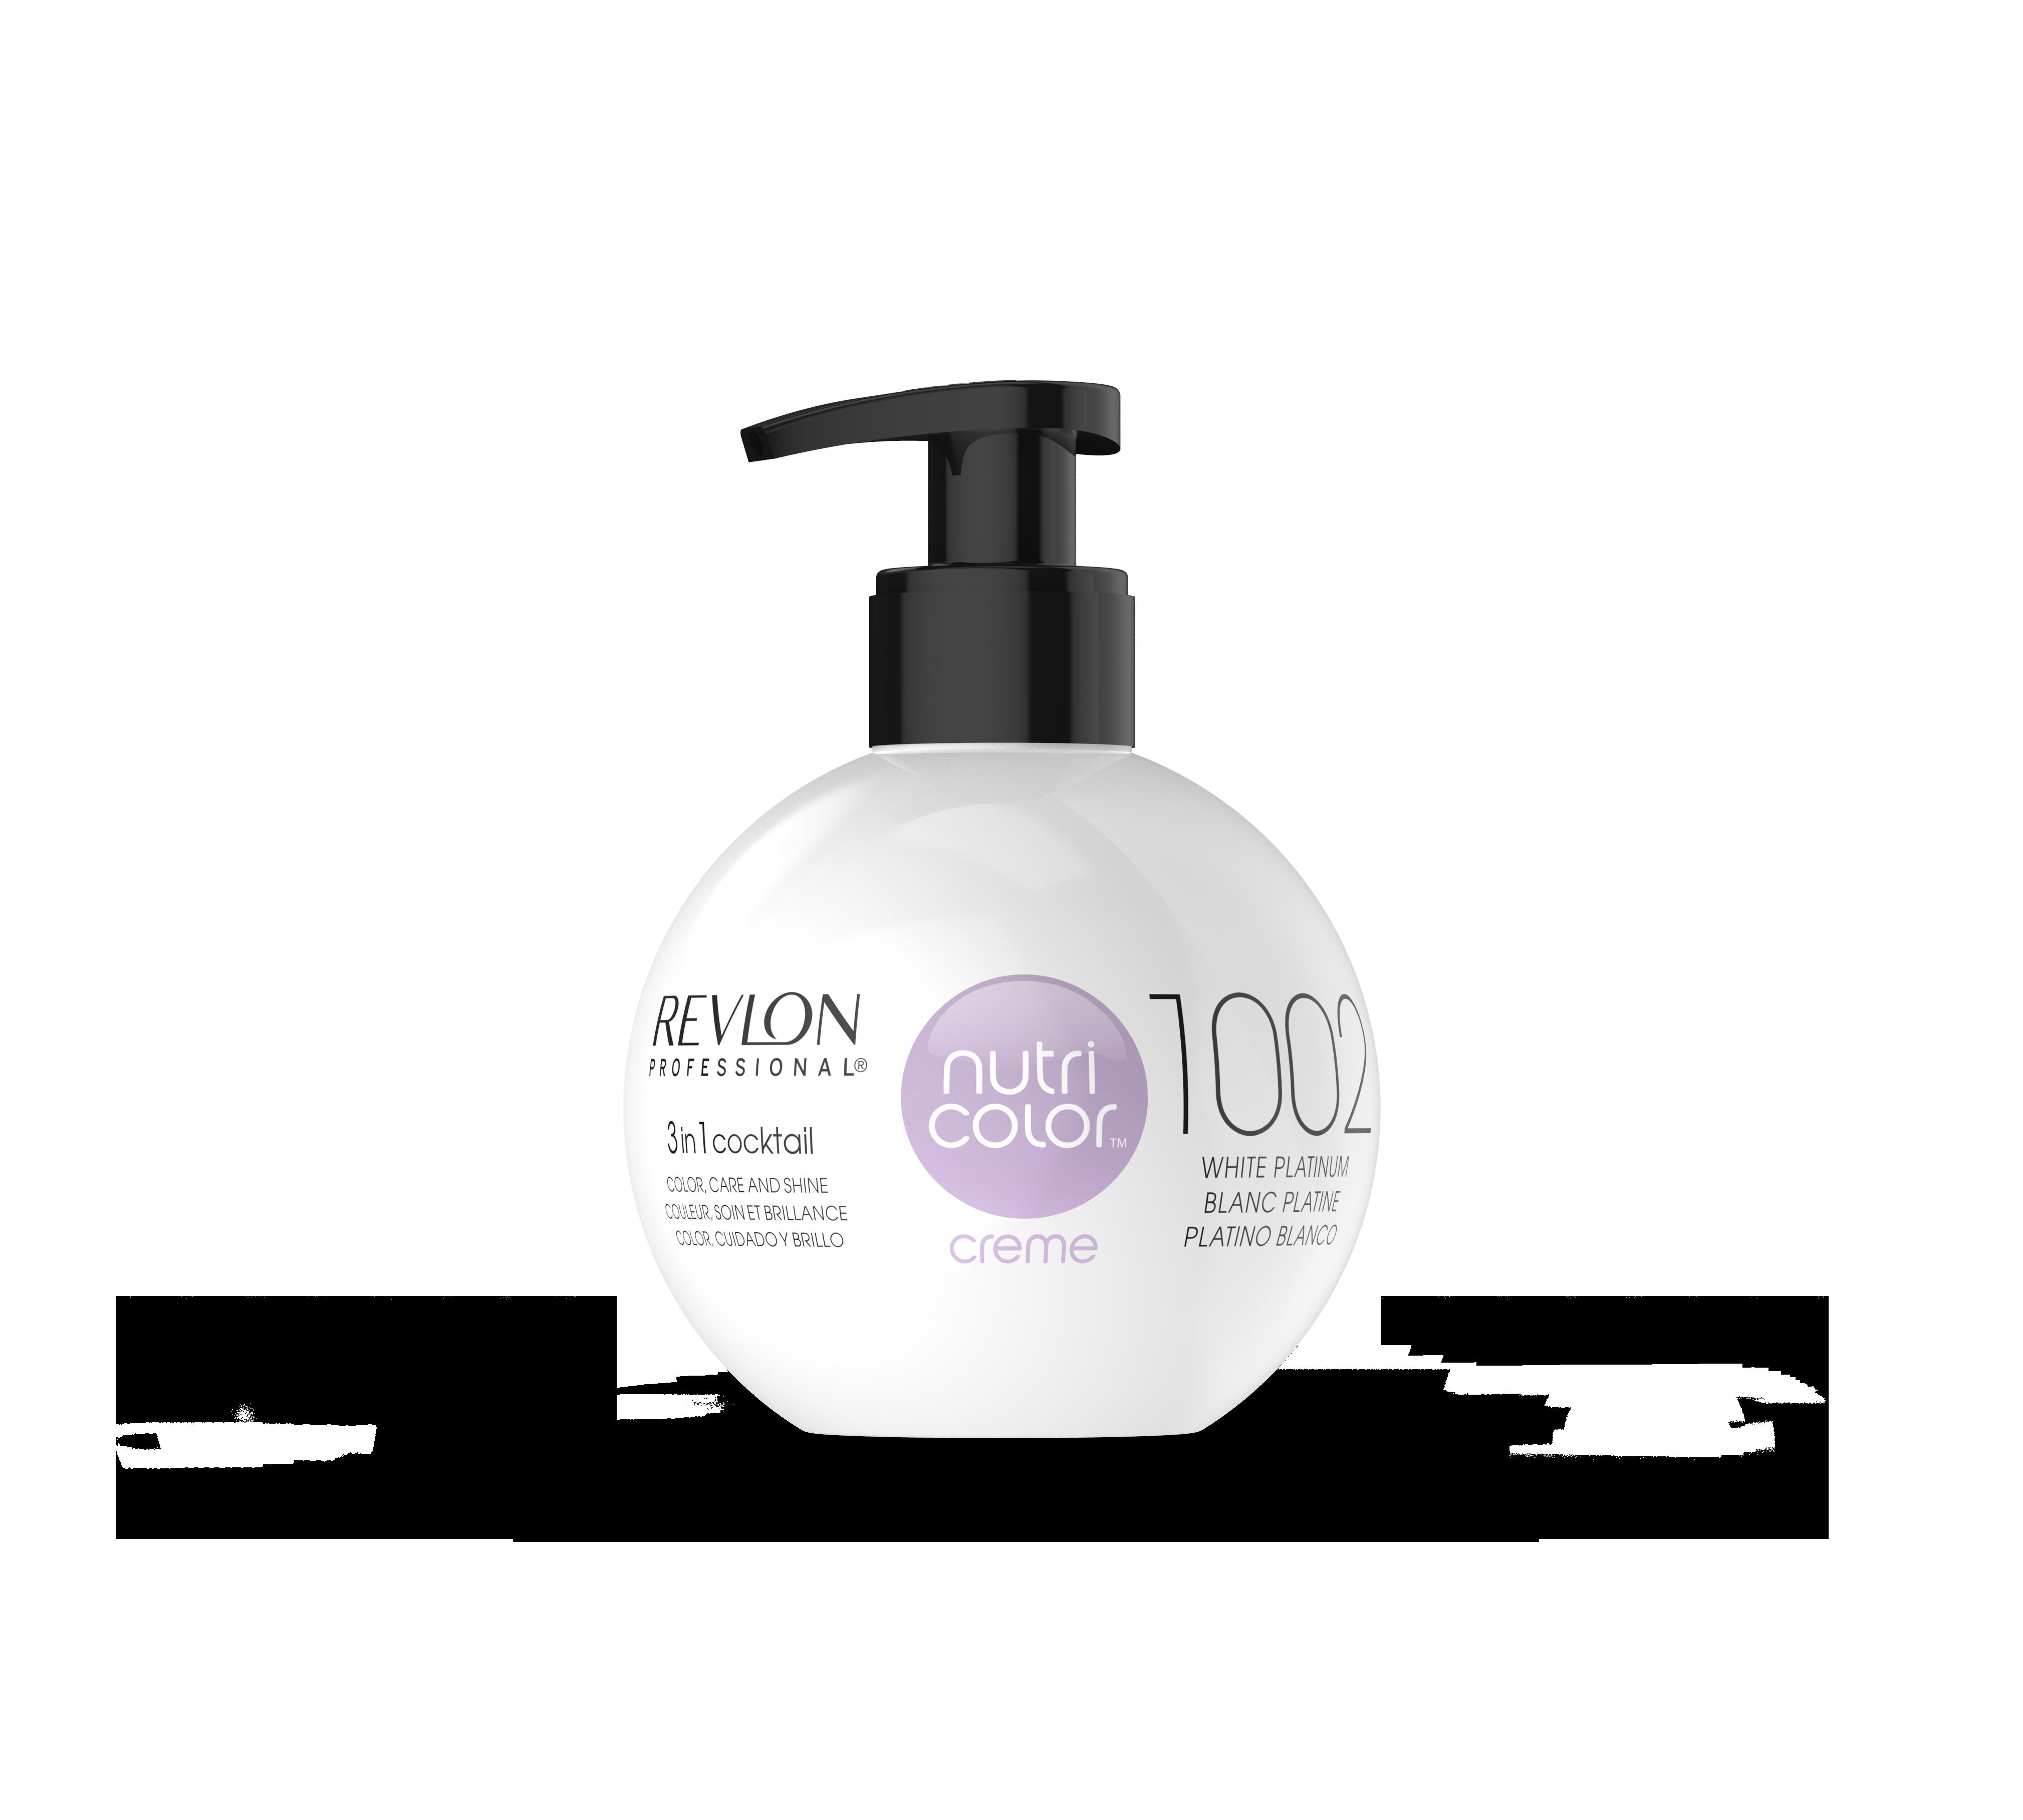 REVLON Professional 1002 краска 3 в 1 для волос, платина / NUTRI COLOR CREME 270 мл